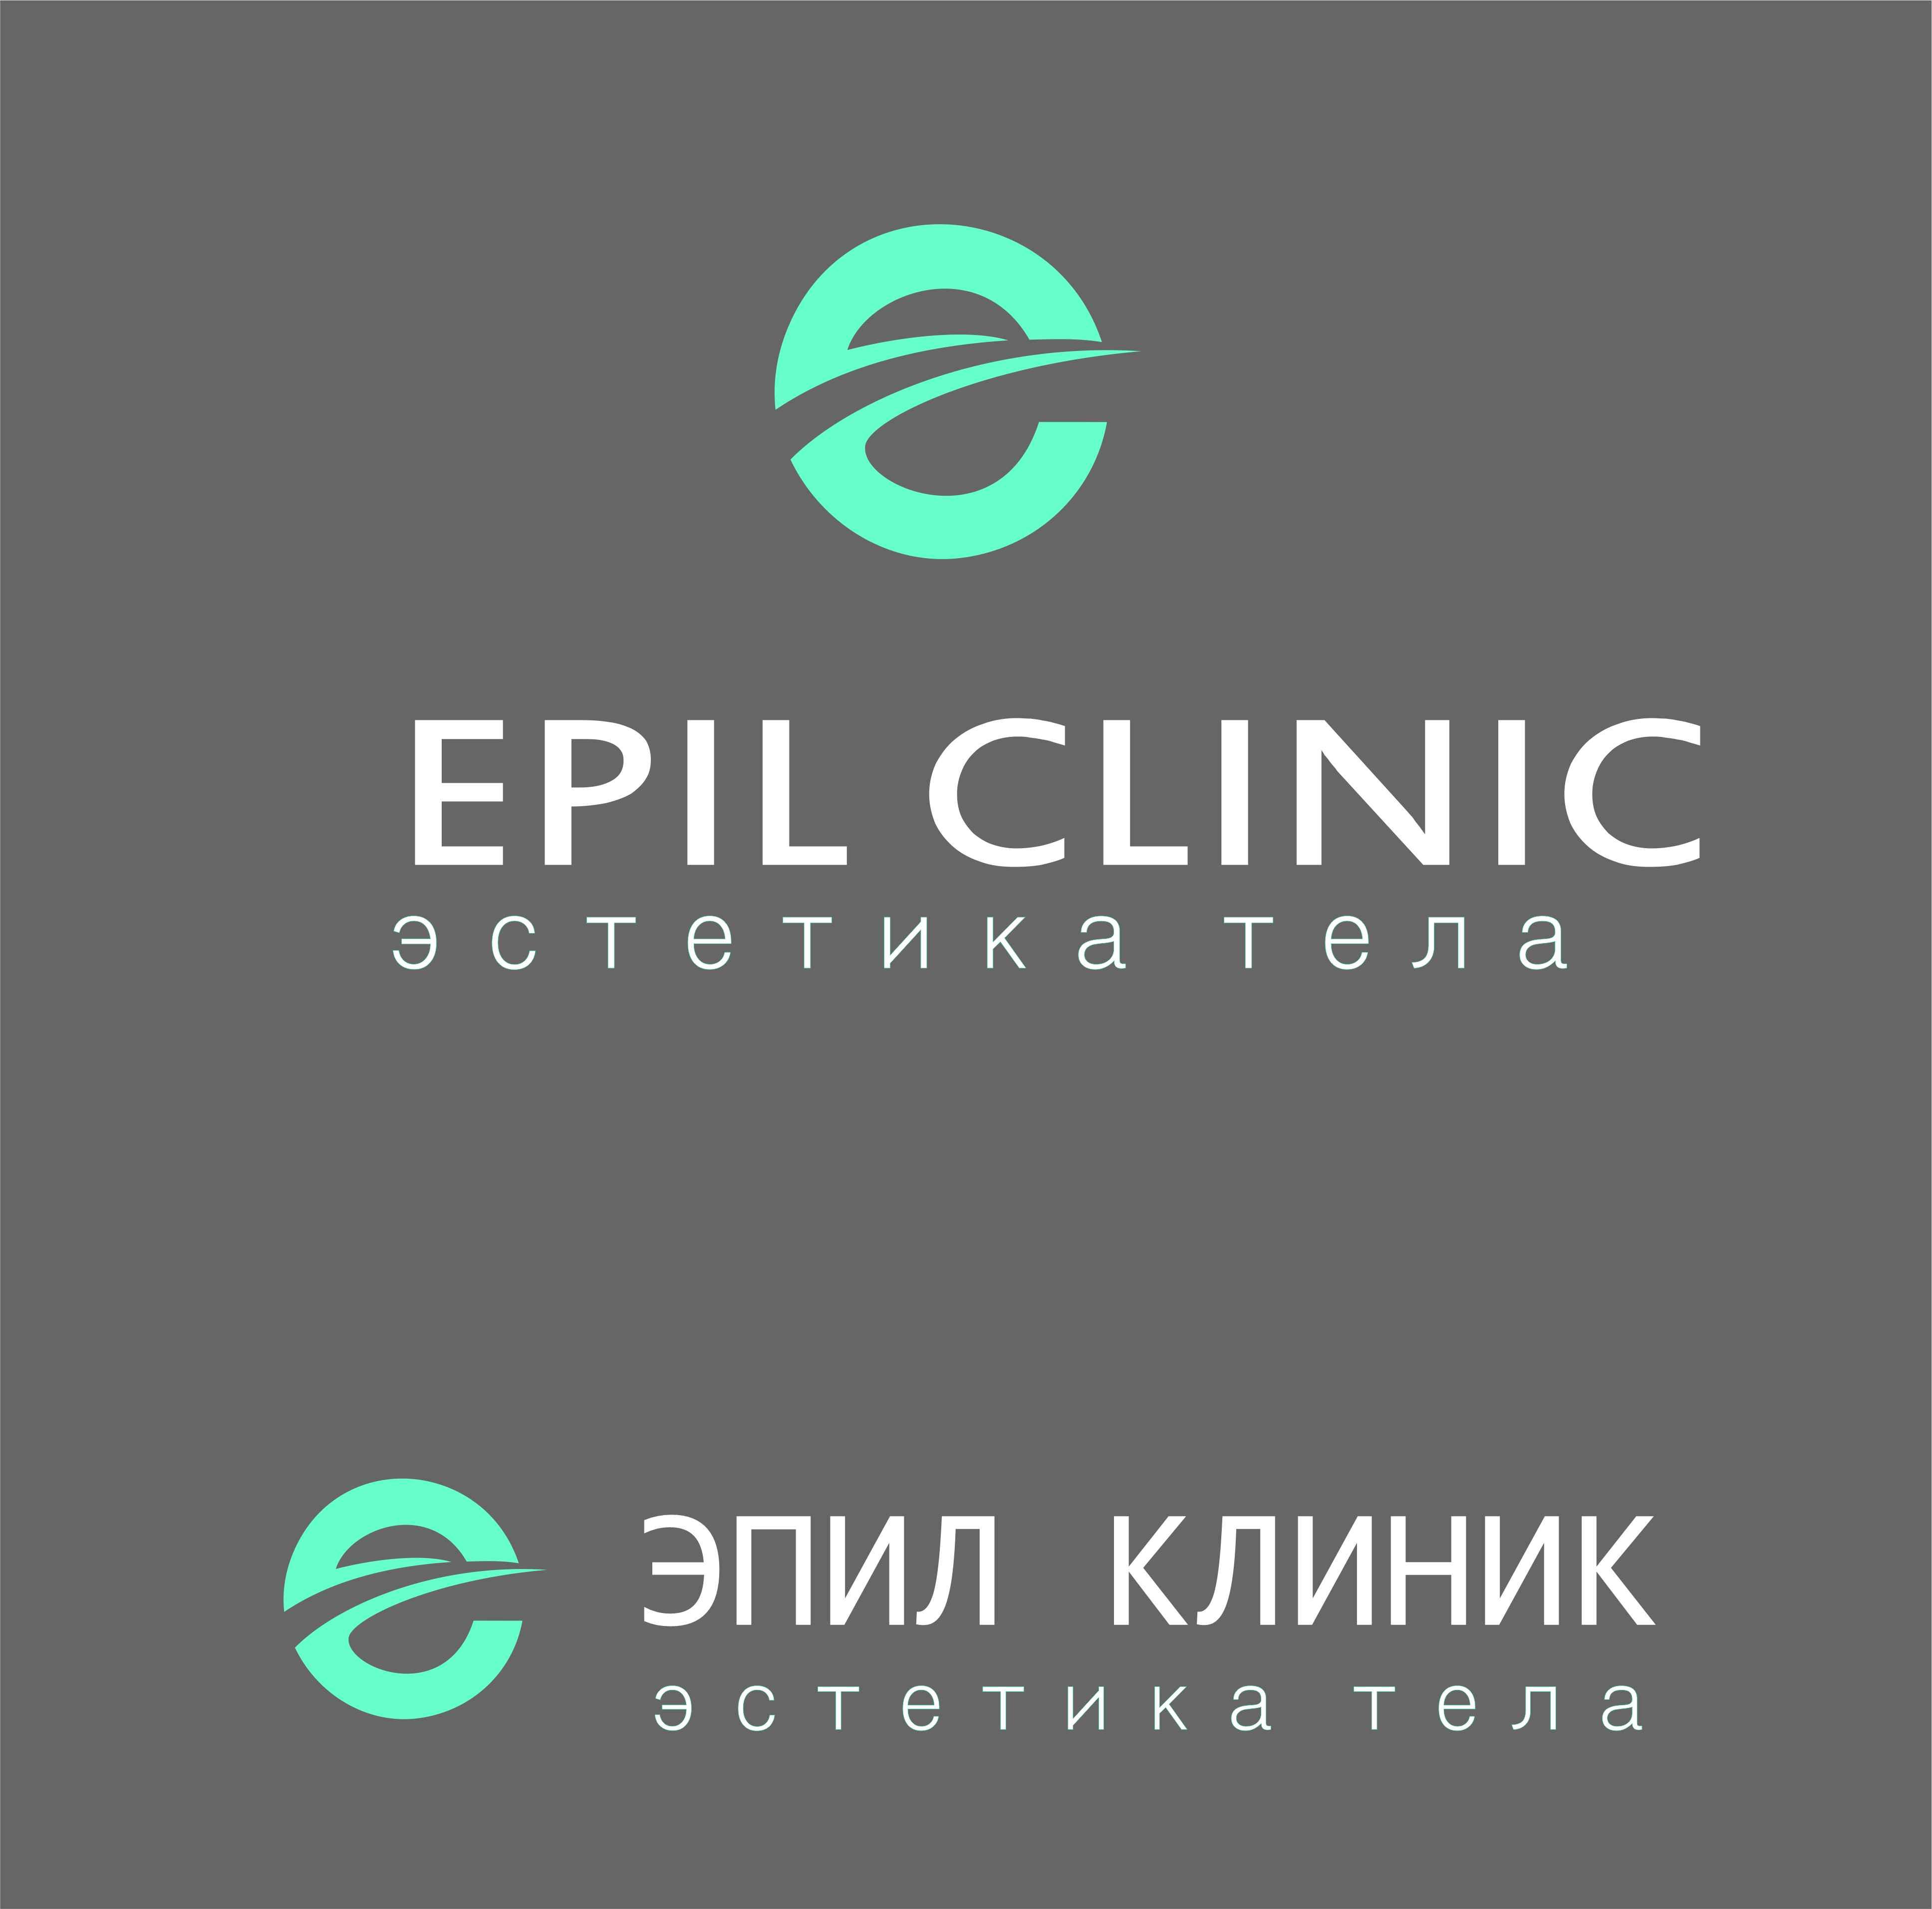 Логотип , фирменный стиль  фото f_4085e19c77410522.jpg